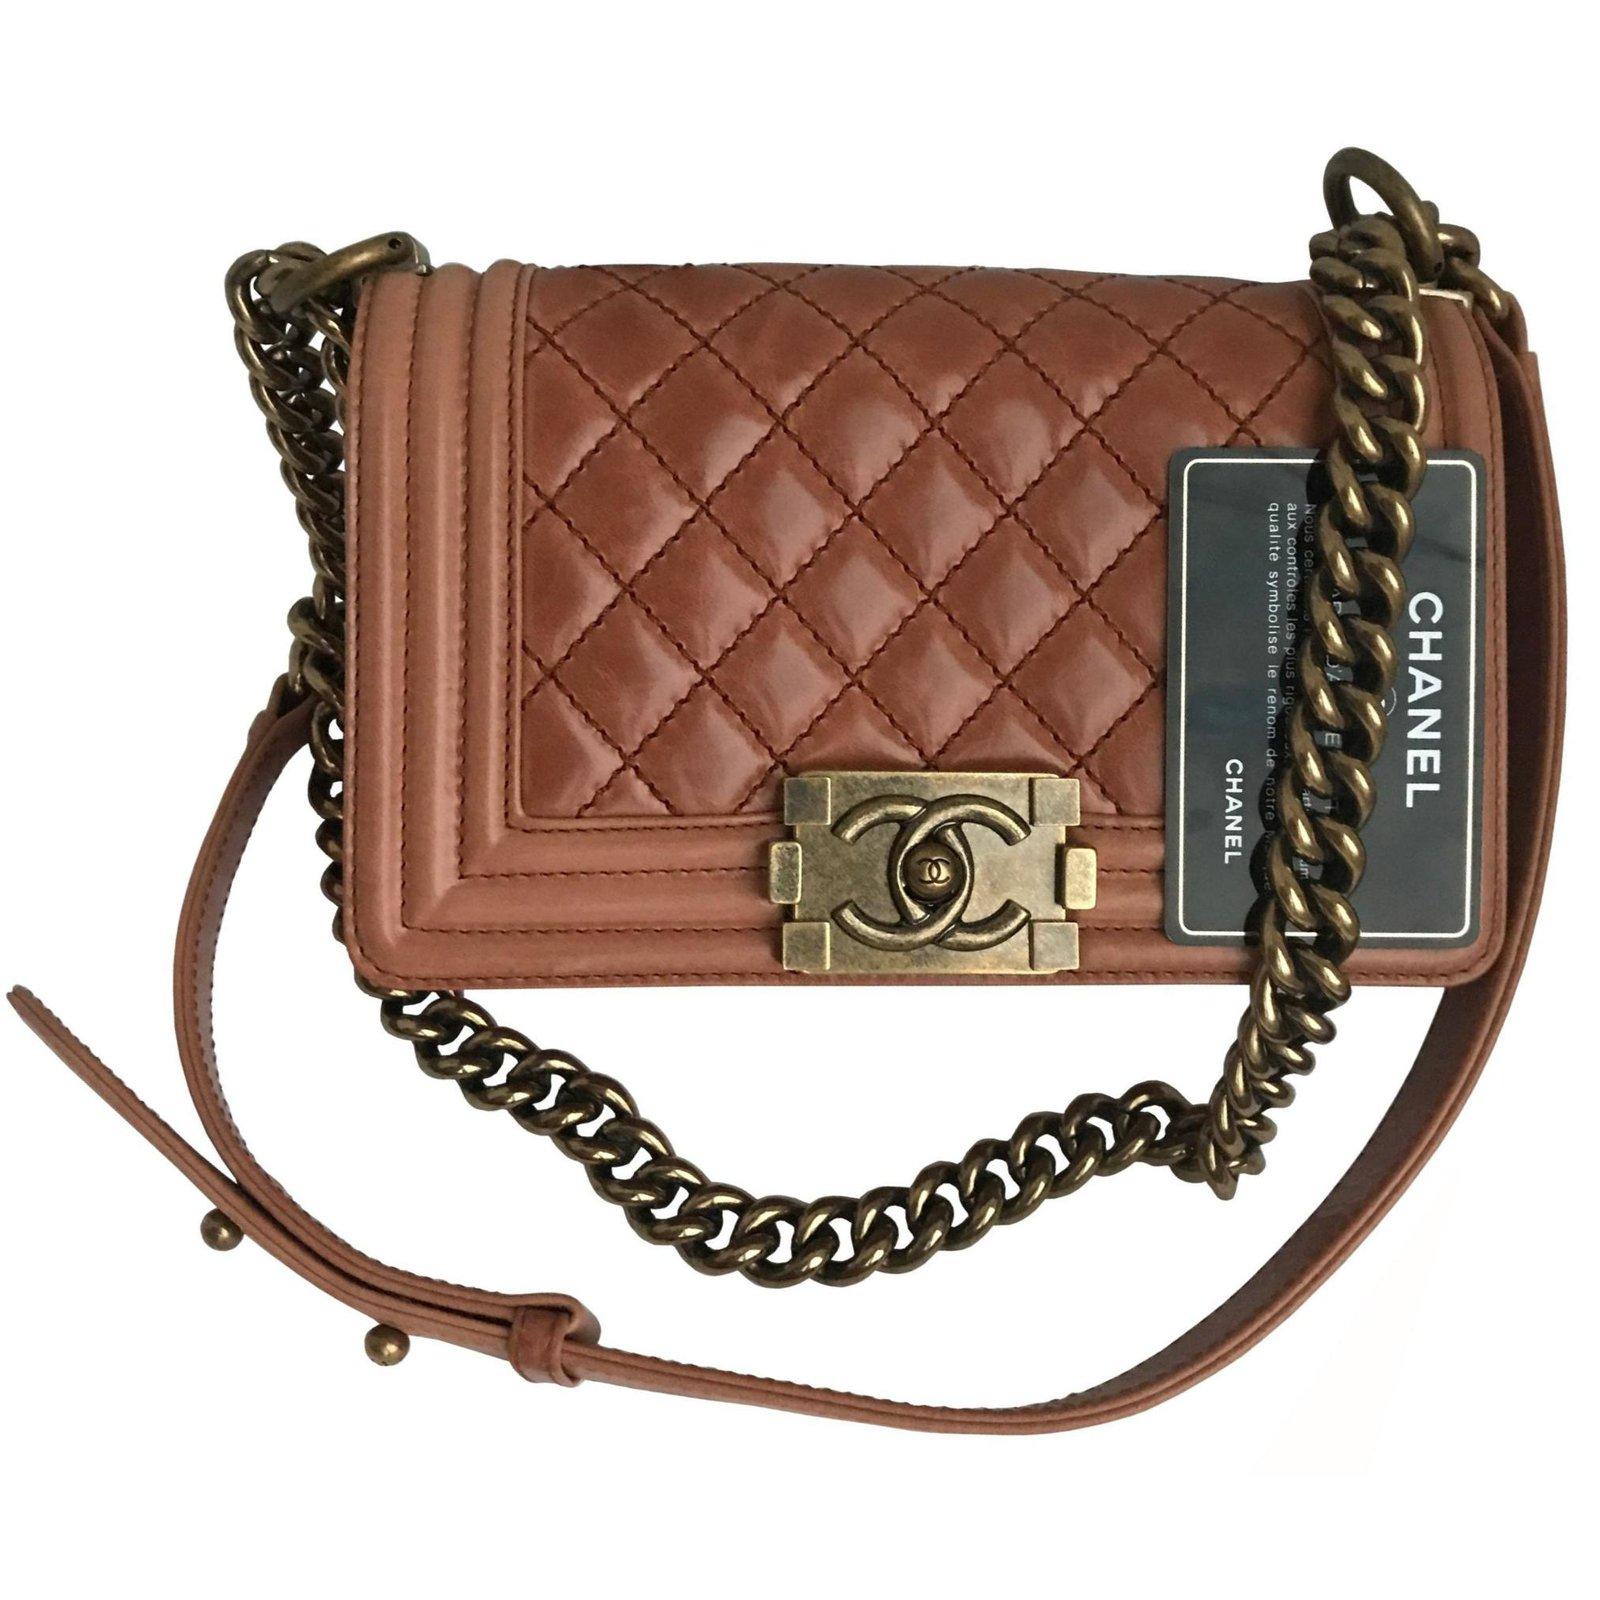 685ca94c7b5c Chanel Never worn w/card Small Boy Flap Bag Handbags Leather Other  ref.120858